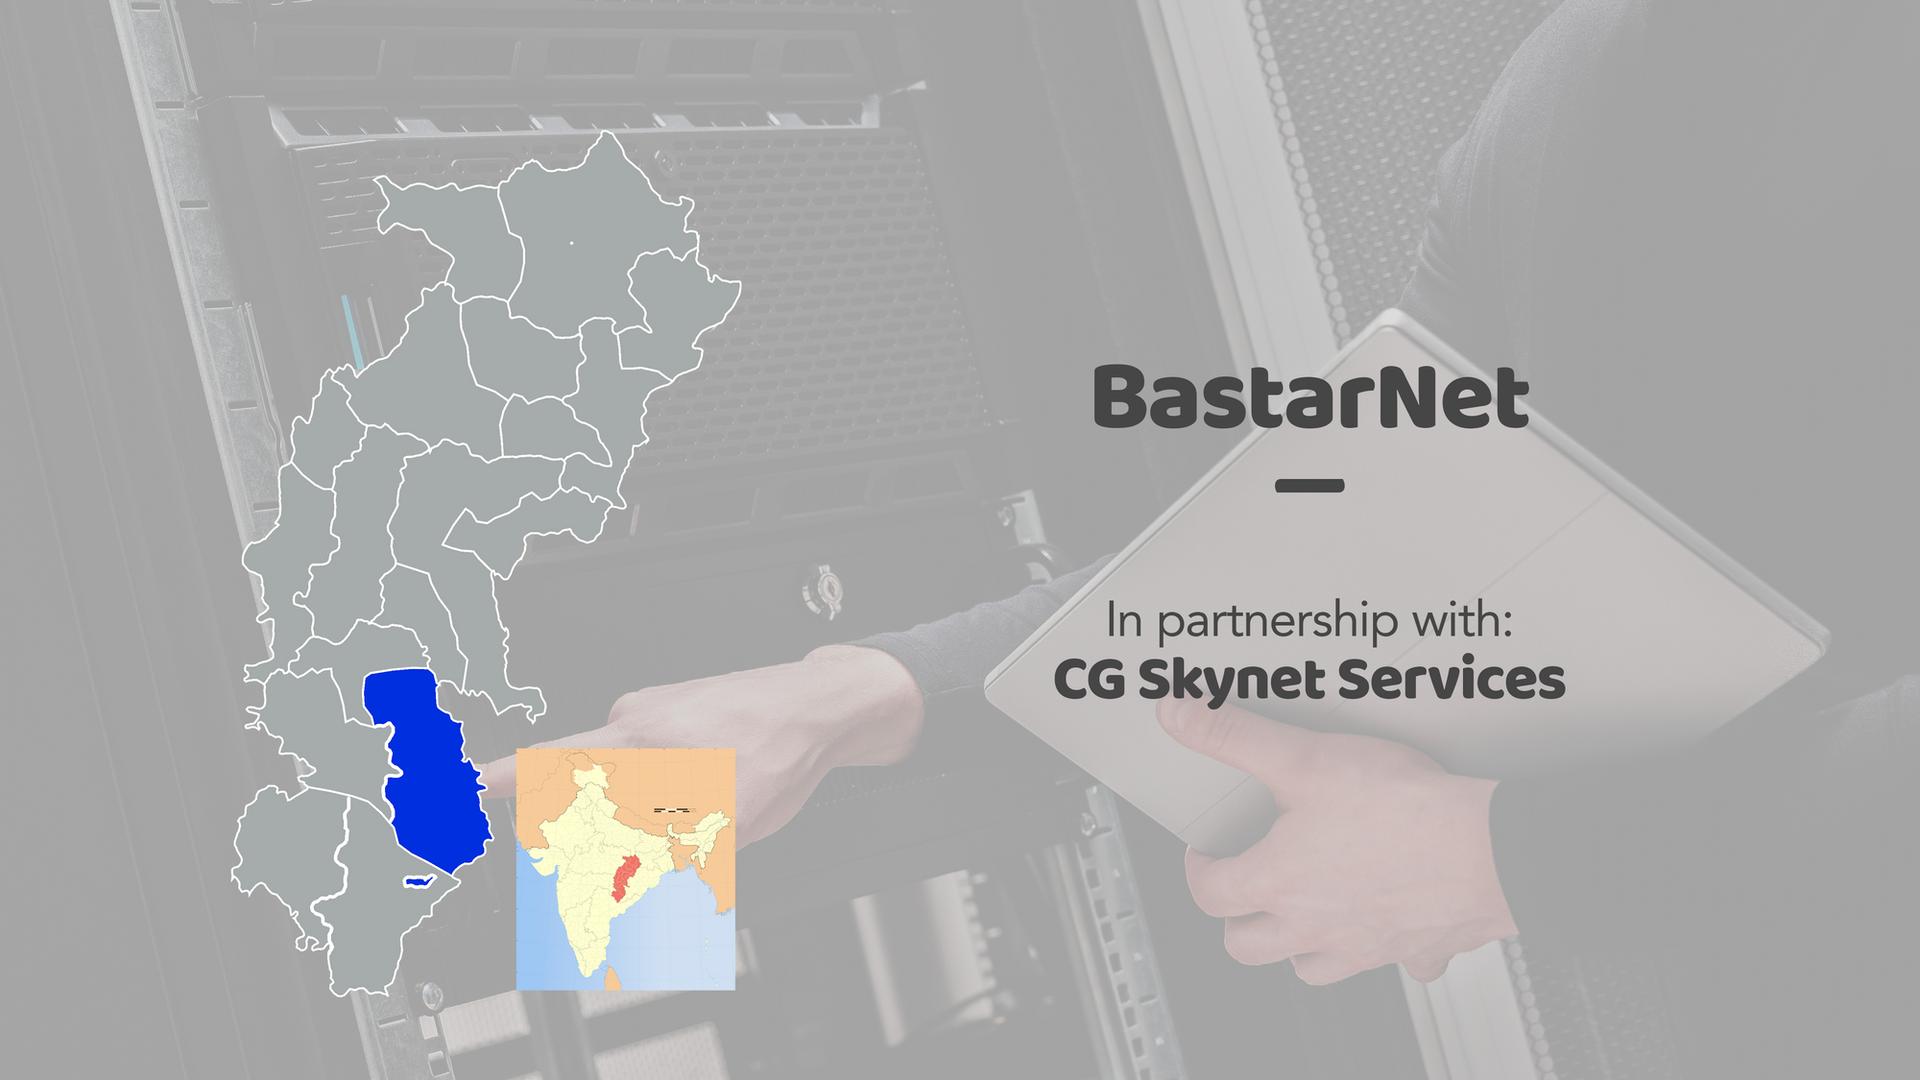 BastarNet